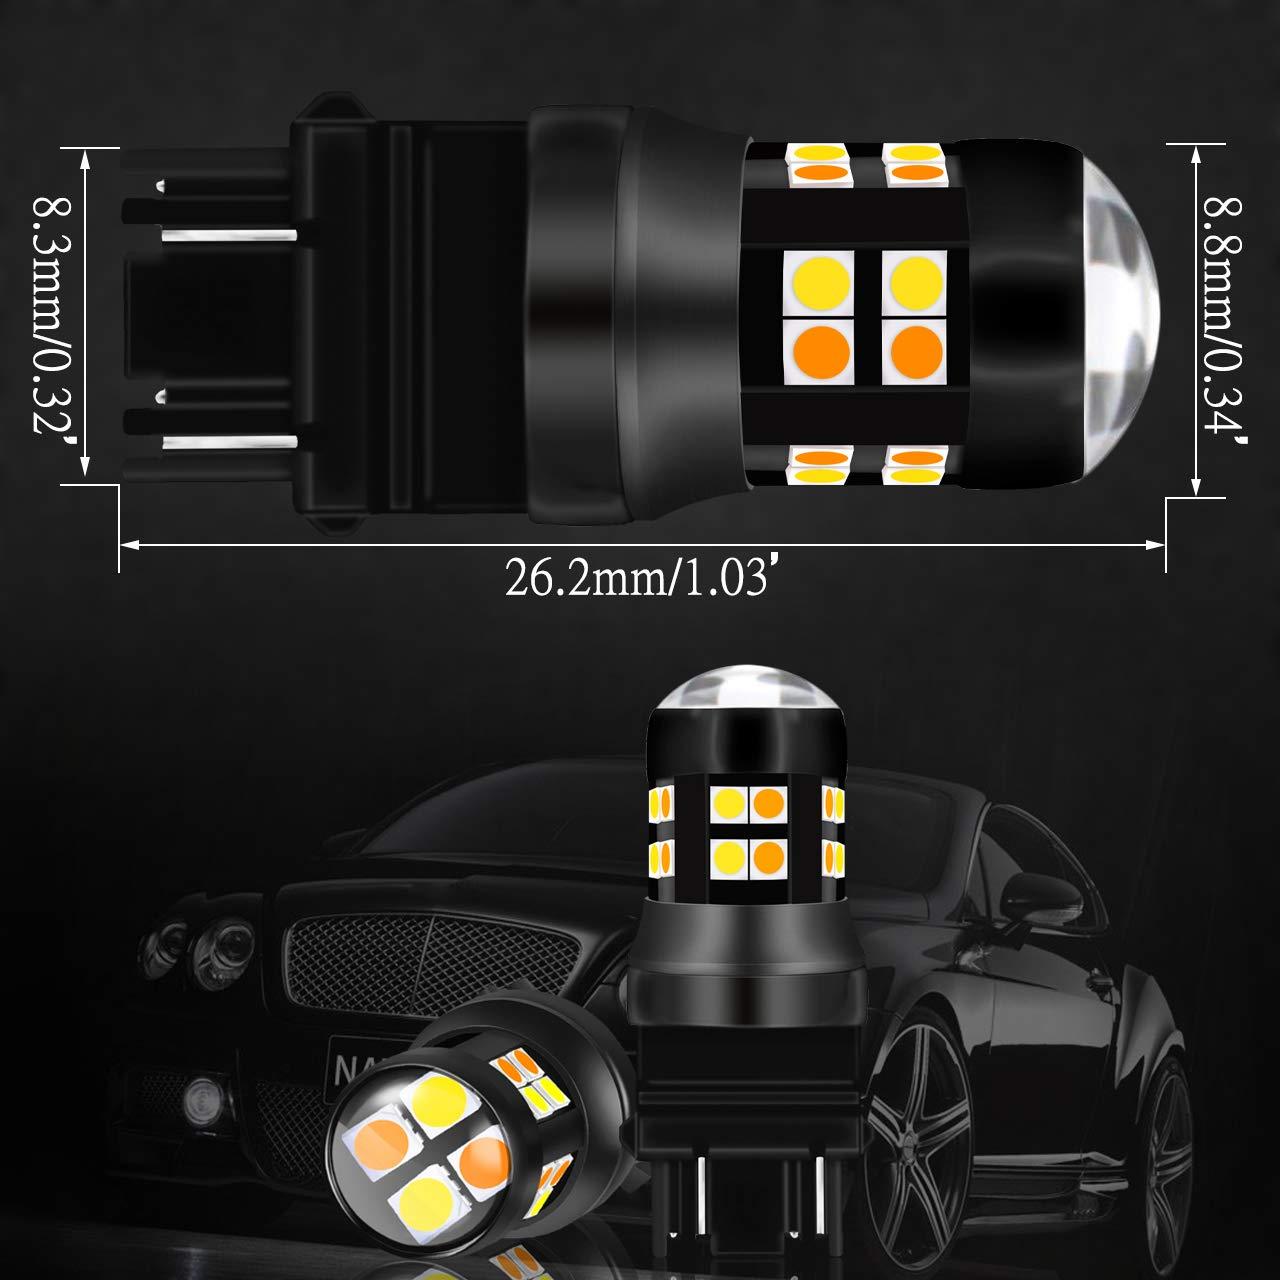 NGCAT 3157 3156 3047 3057 LED Bulb 6500K 1200LM 3030 24-SMD Dual Color White//Amber Canbus Error Free for Switchback Turn Signal Light with 50W 8ohm Load Resistors 2PCS Led Bulb + 2PCS Load Resistors